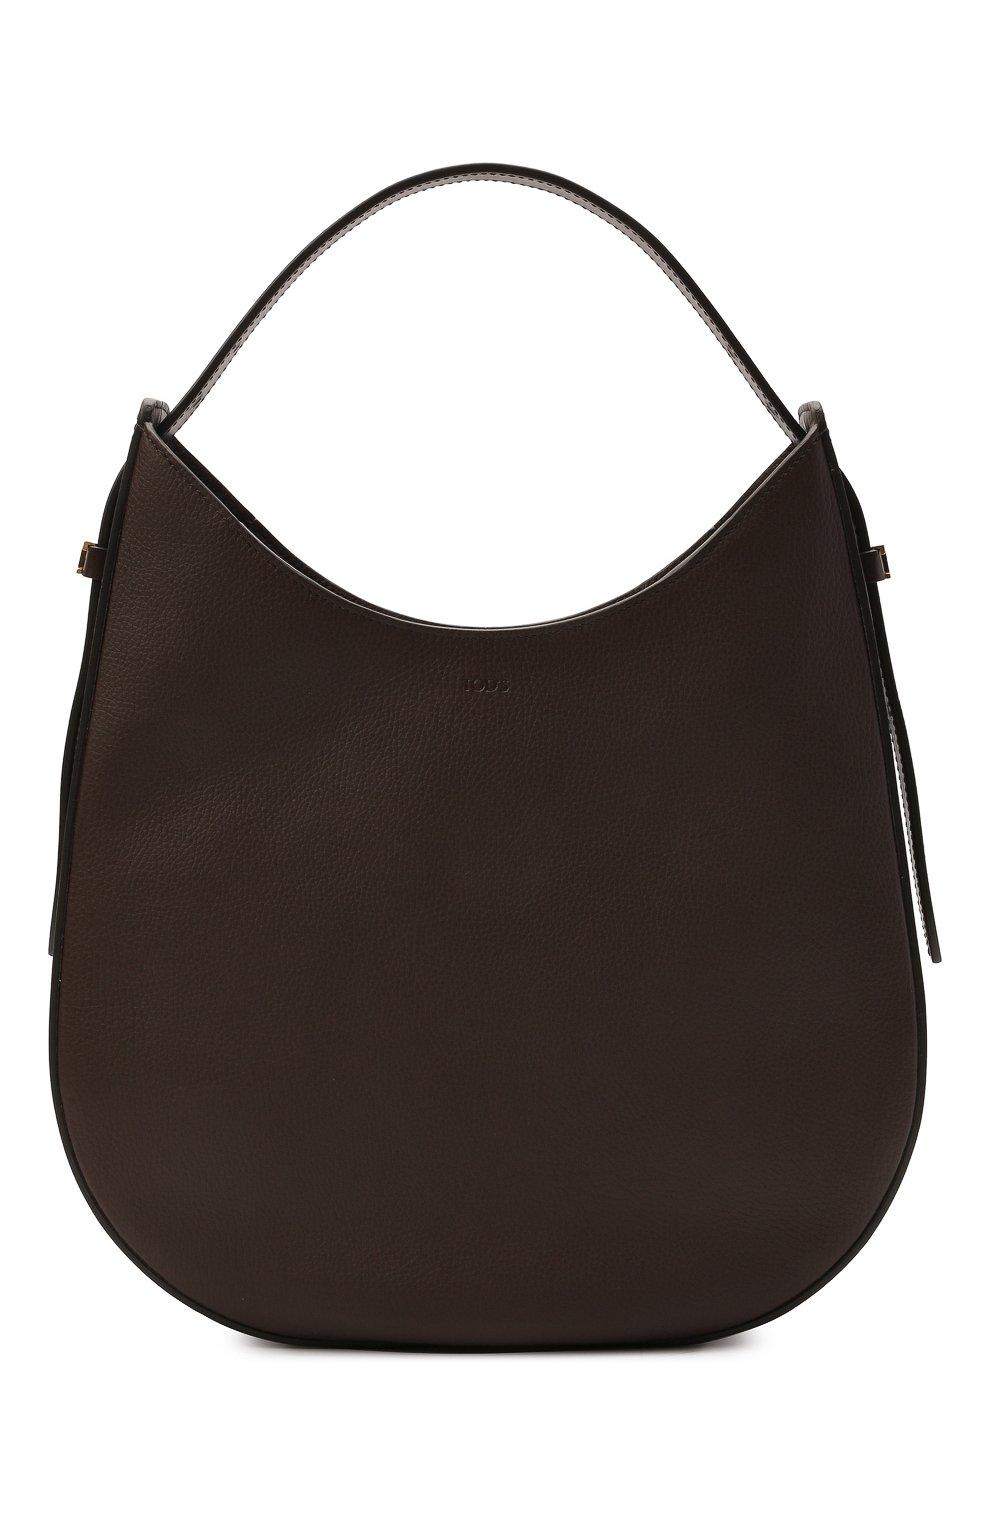 Женская сумка oboe TOD'S темно-коричневого цвета, арт. XBWA0RS0300P6Y | Фото 1 (Сумки-технические: Сумки top-handle; Материал: Натуральная кожа; Размер: large)